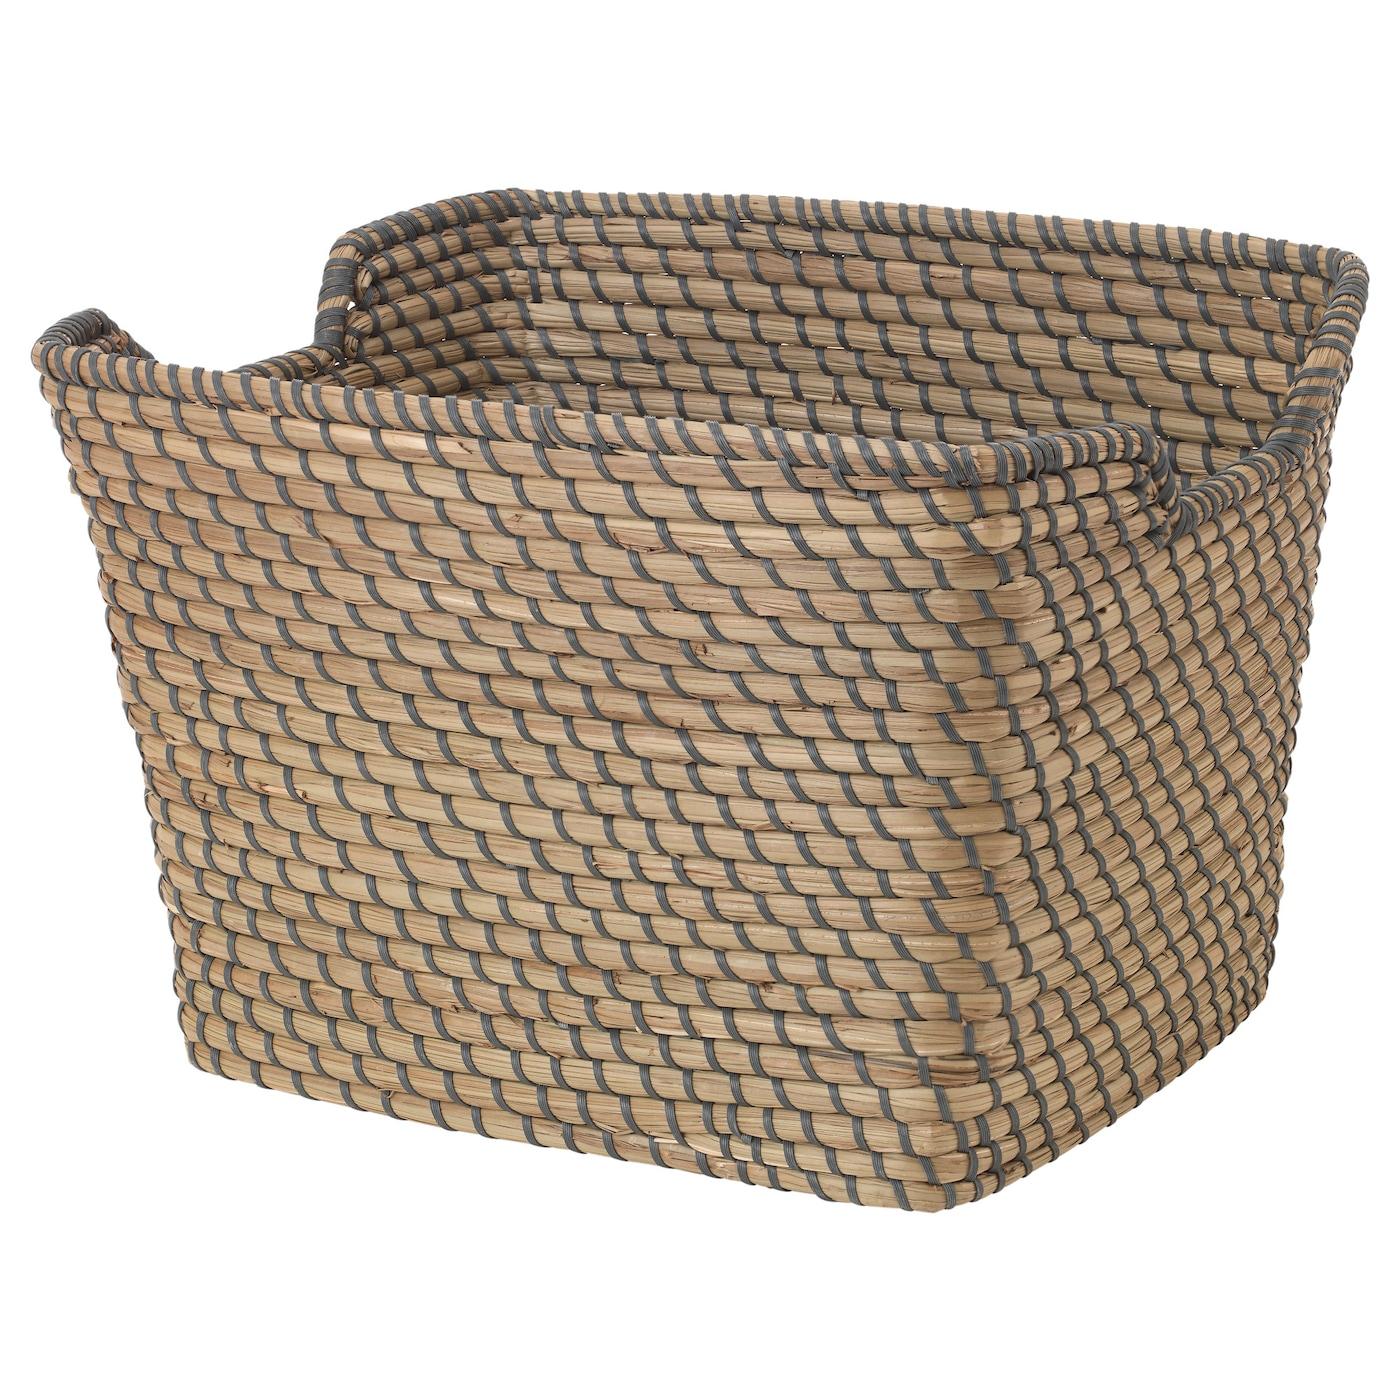 Sunden basket dark grey 30 x 36 x 25 cm ikea - Ikea salle de bain accessoires ...